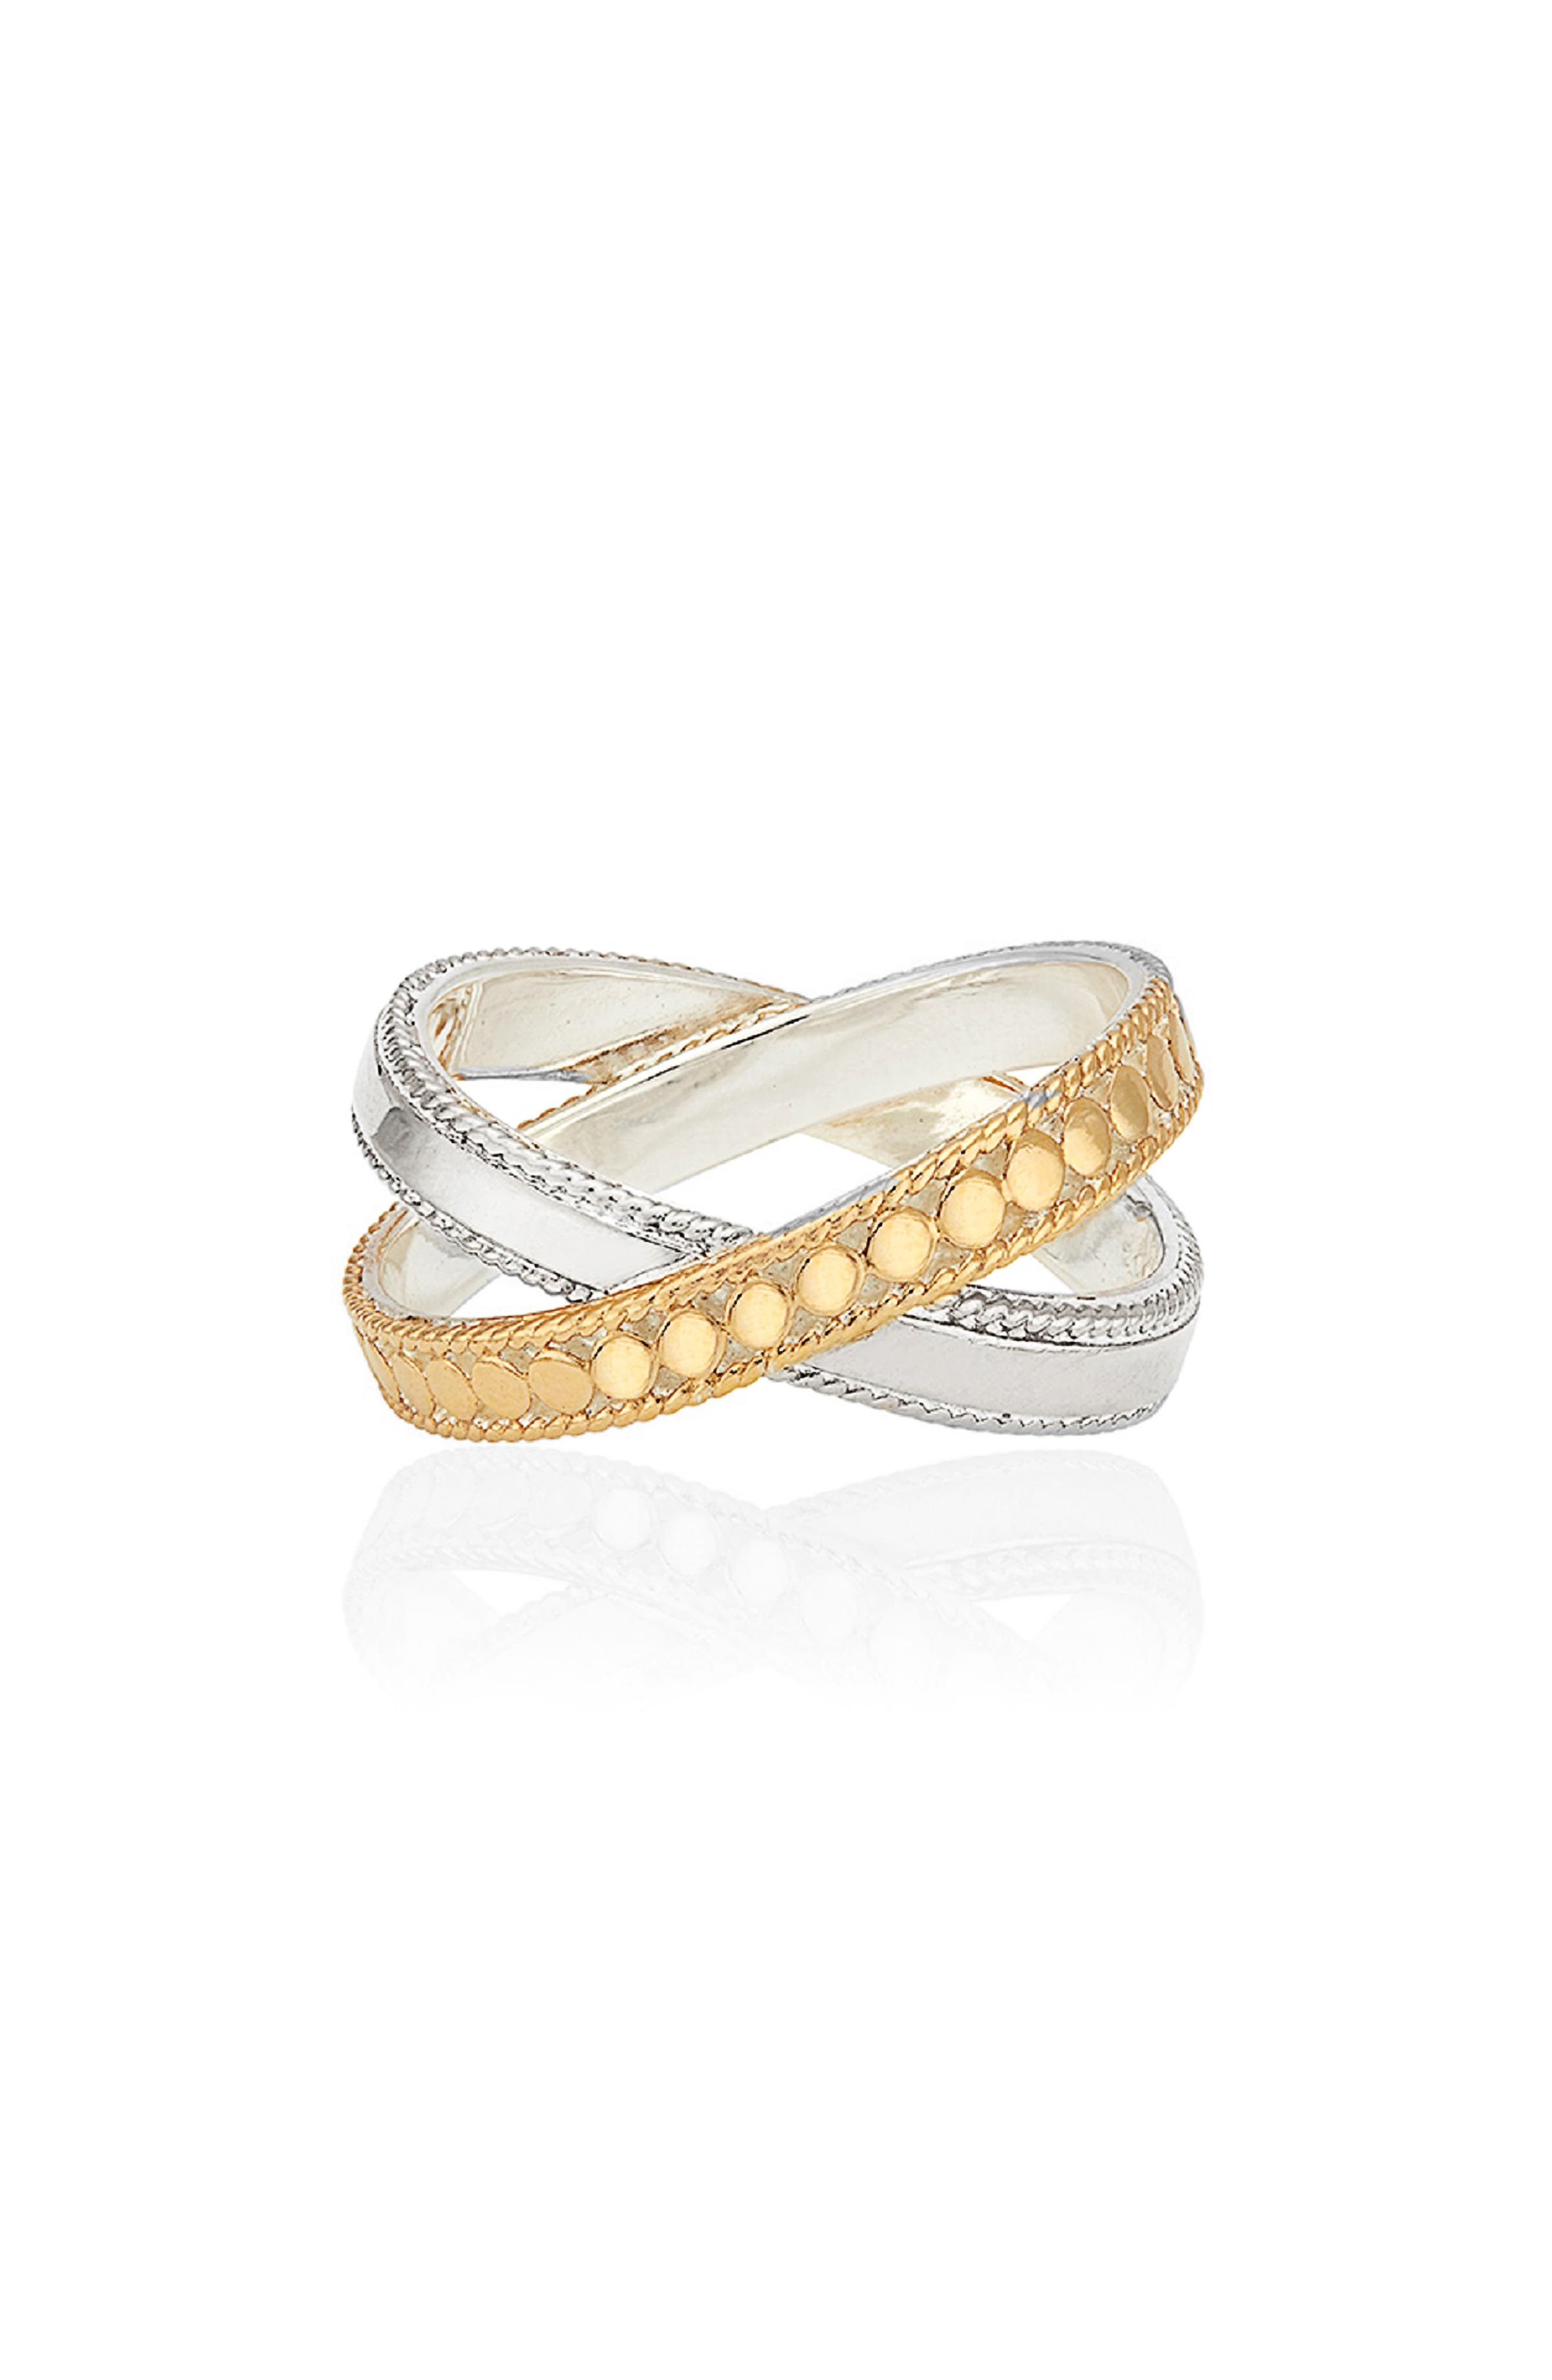 Two-Tone Crisscross Ring